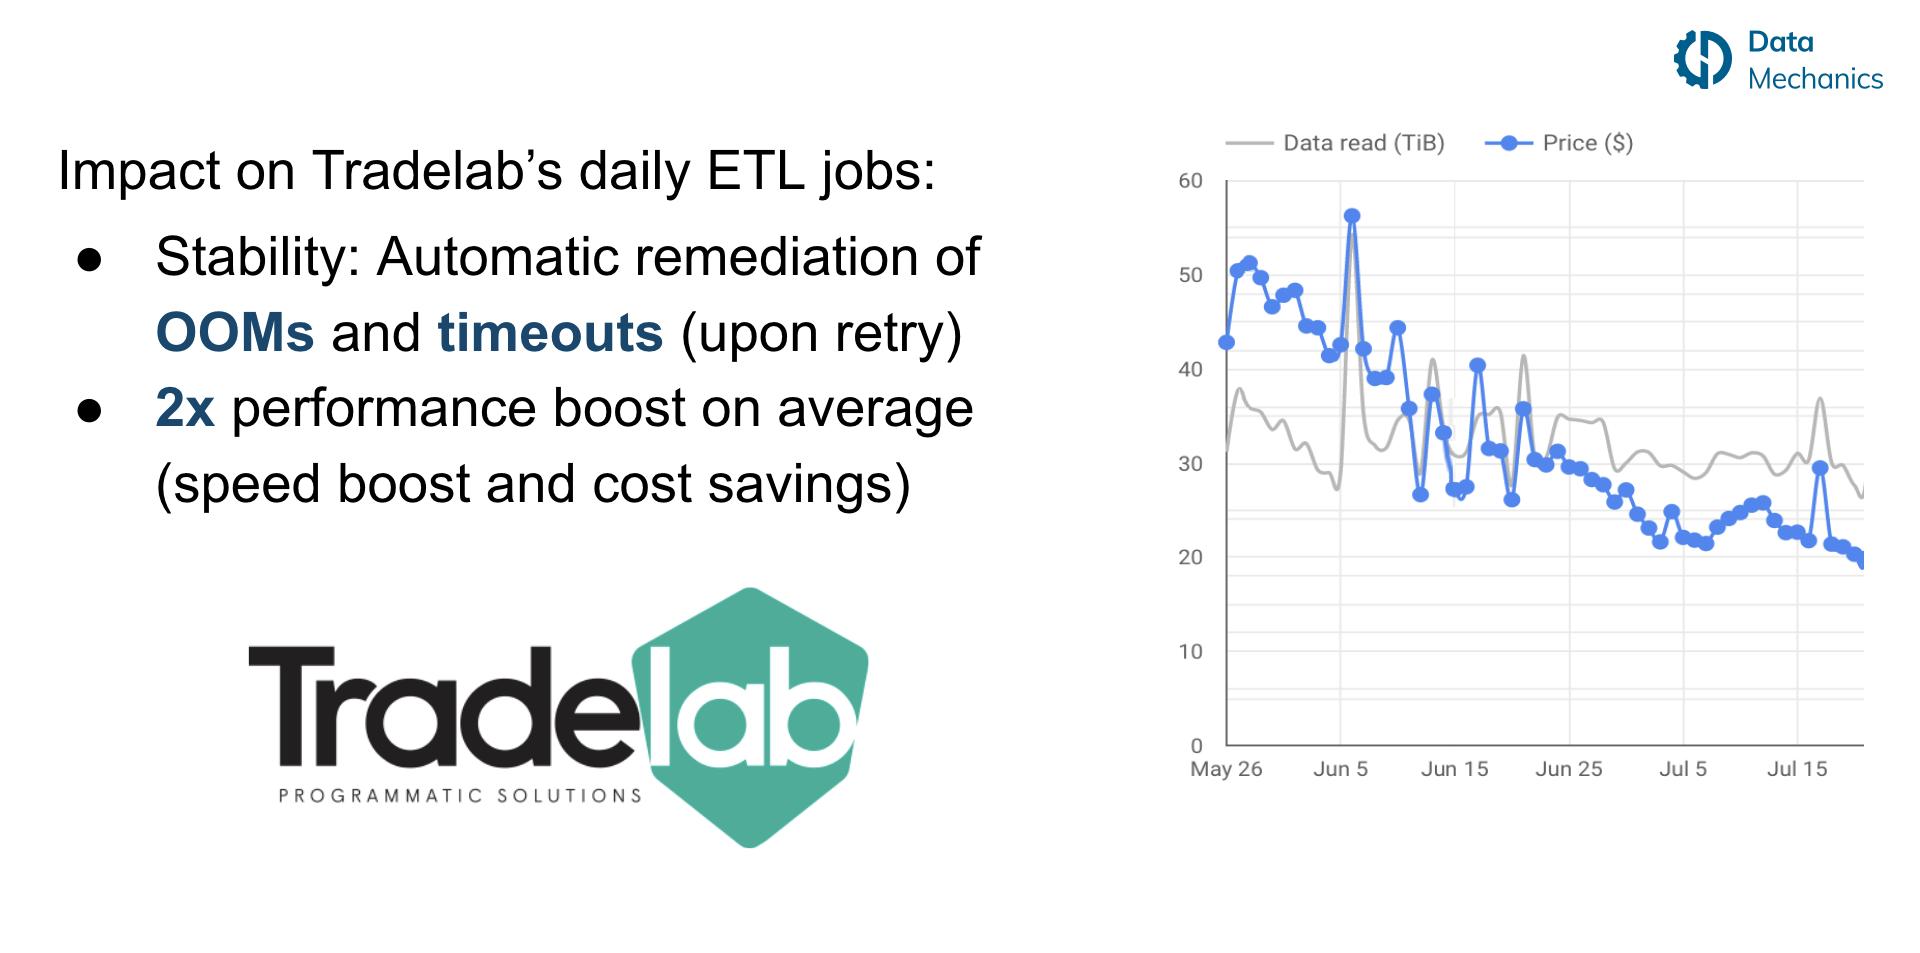 2x Performance Boost on average on Tradelab'